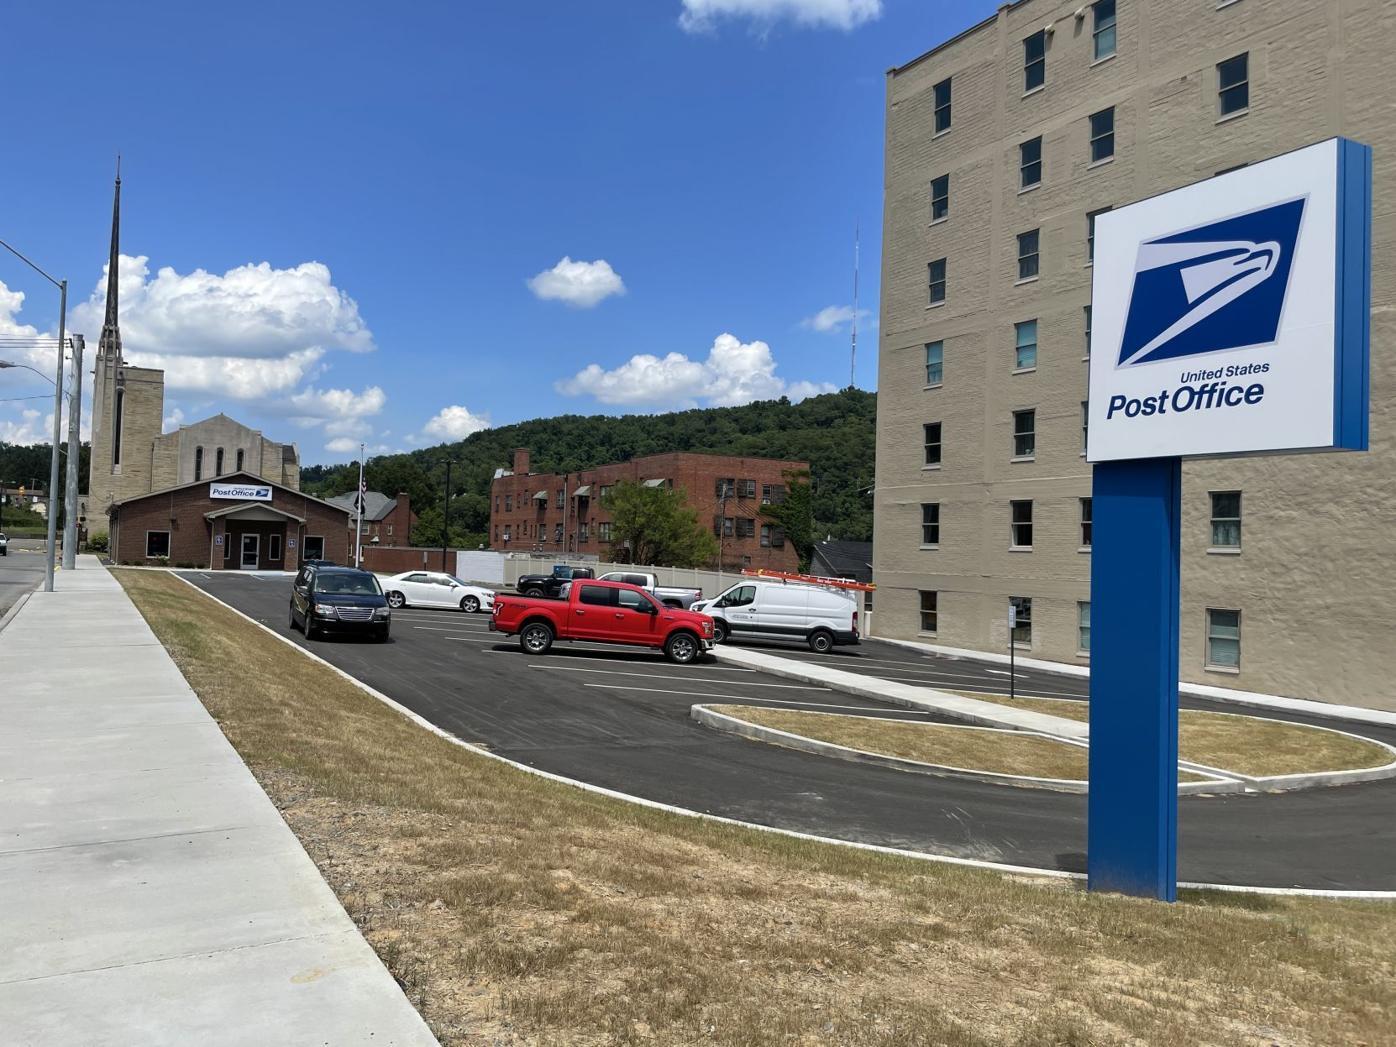 Post office parking lot